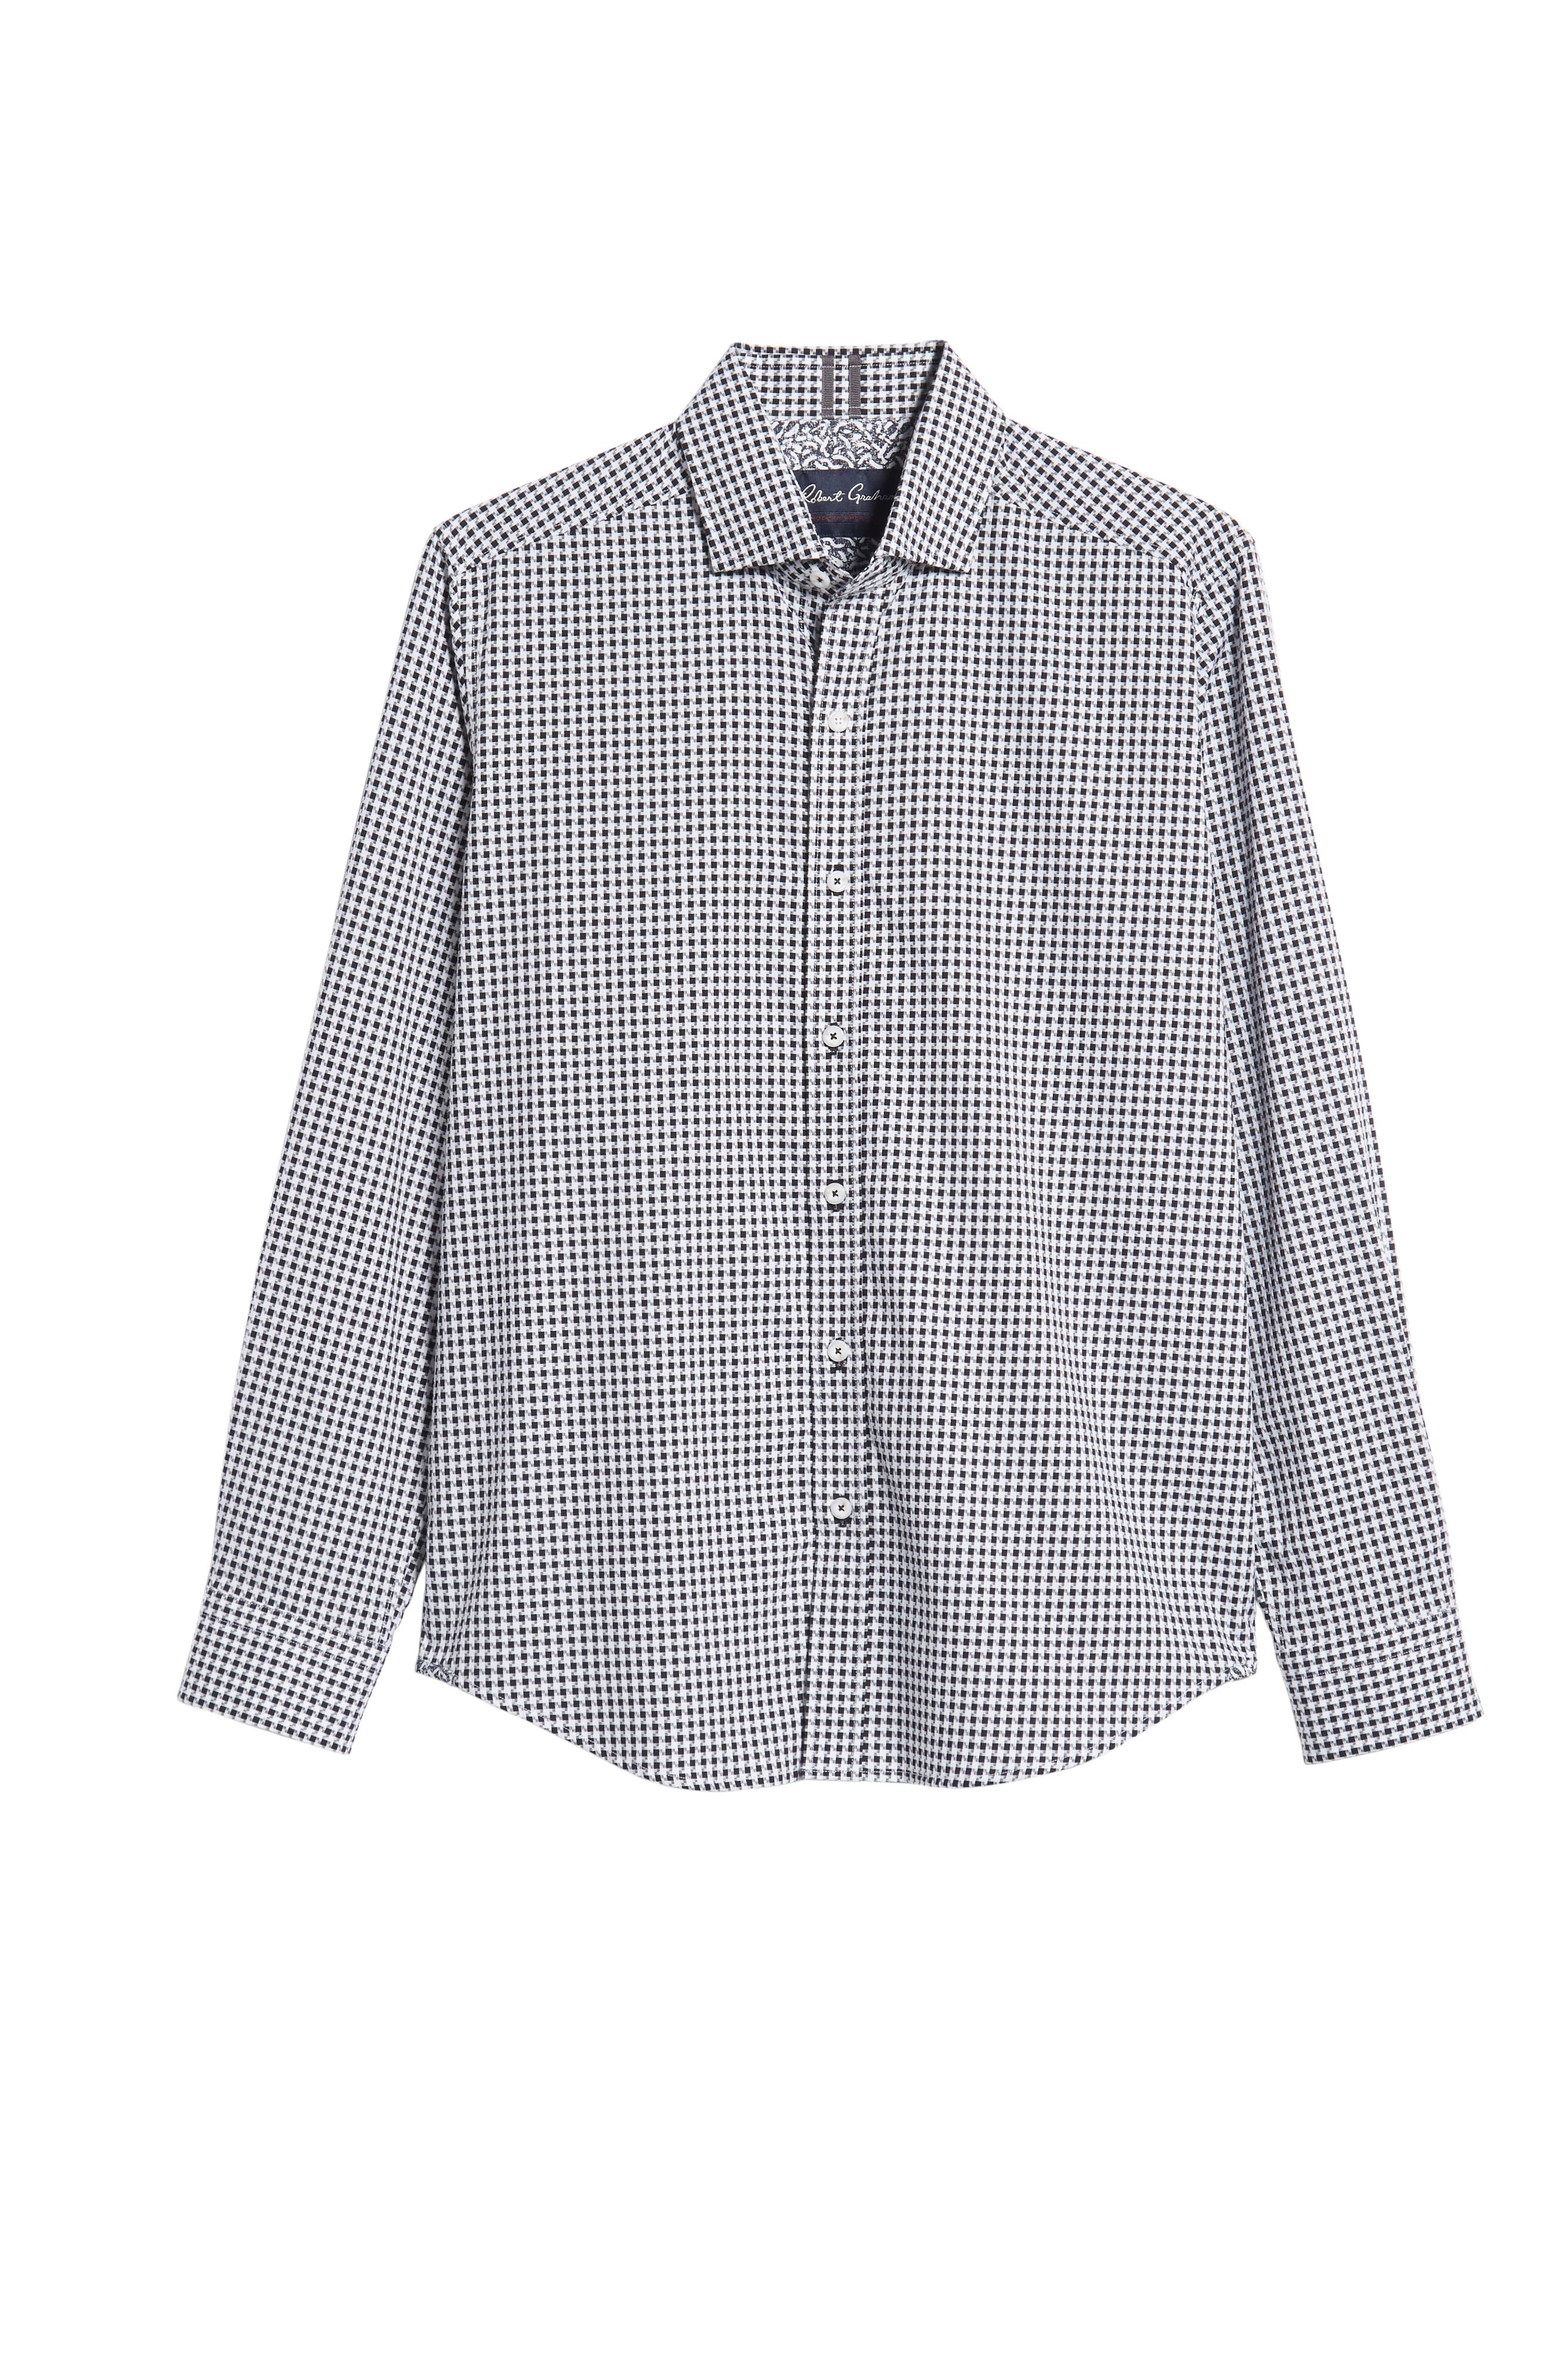 Emmett Tailored Fit Sport Shirt,                             Alternate thumbnail 5, color,                             BLACK